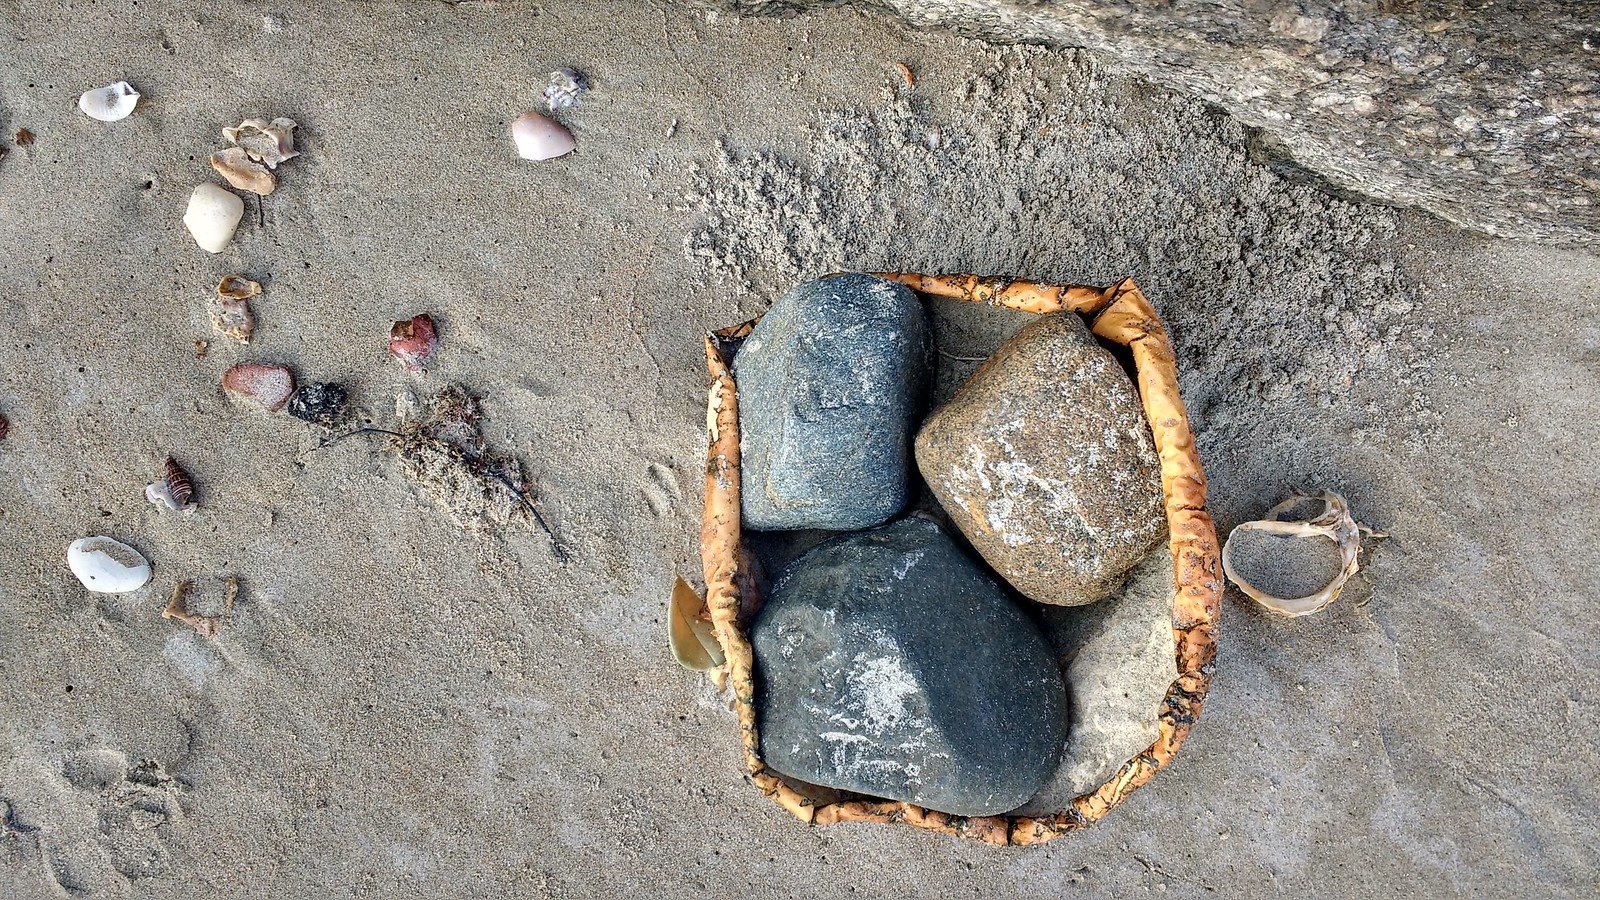 Tray of stones